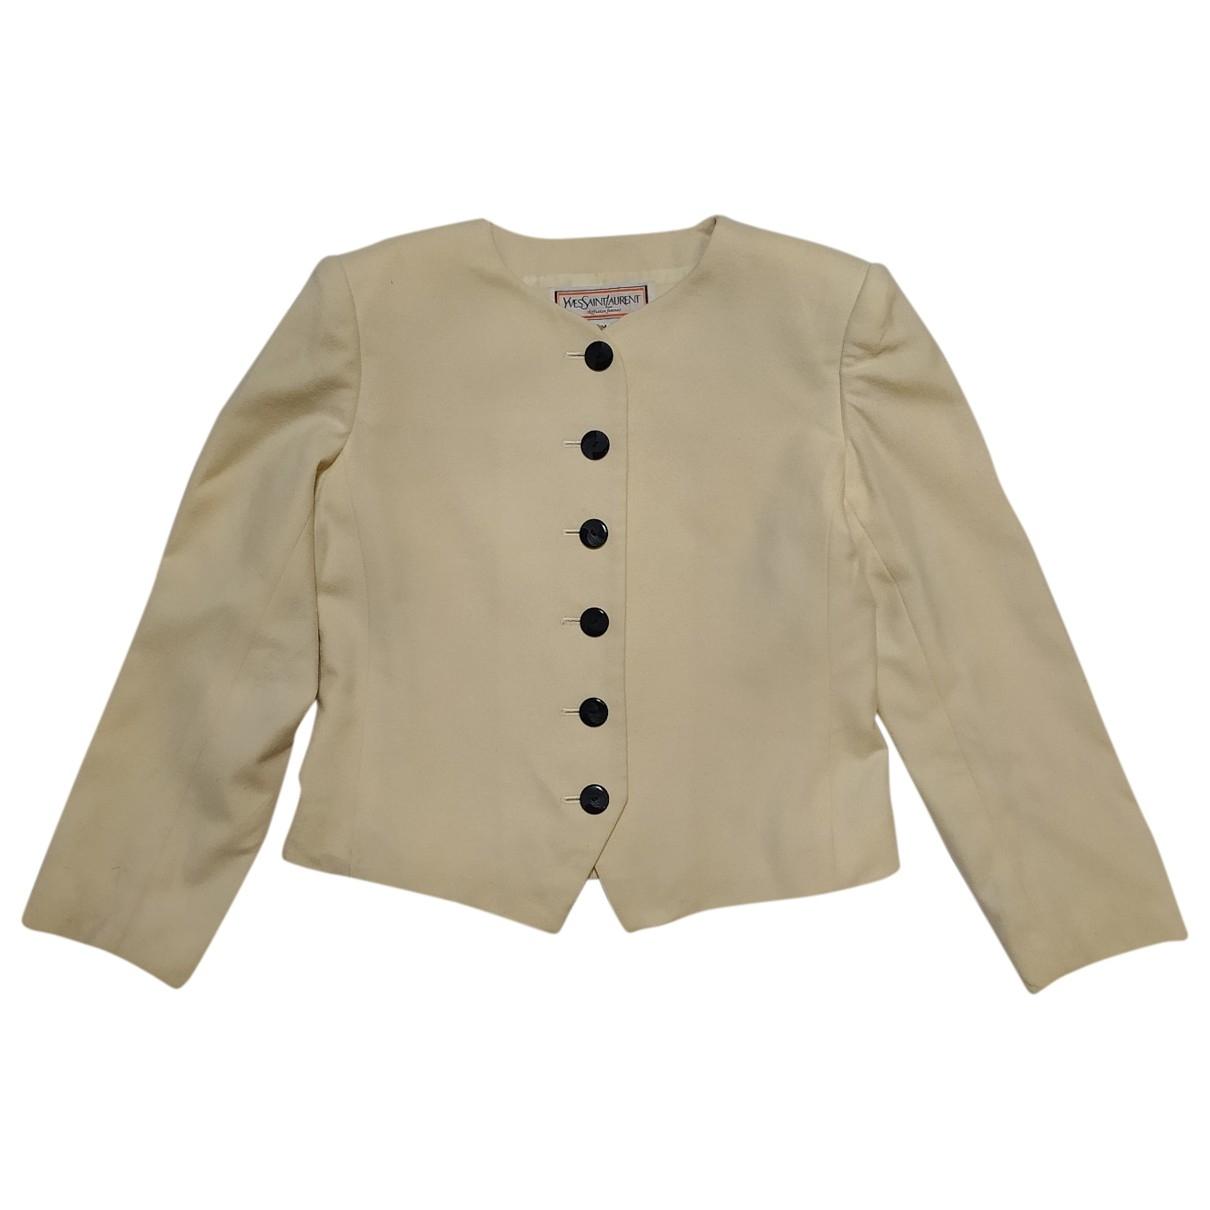 Yves Saint Laurent \N Ecru Wool jacket for Women M International